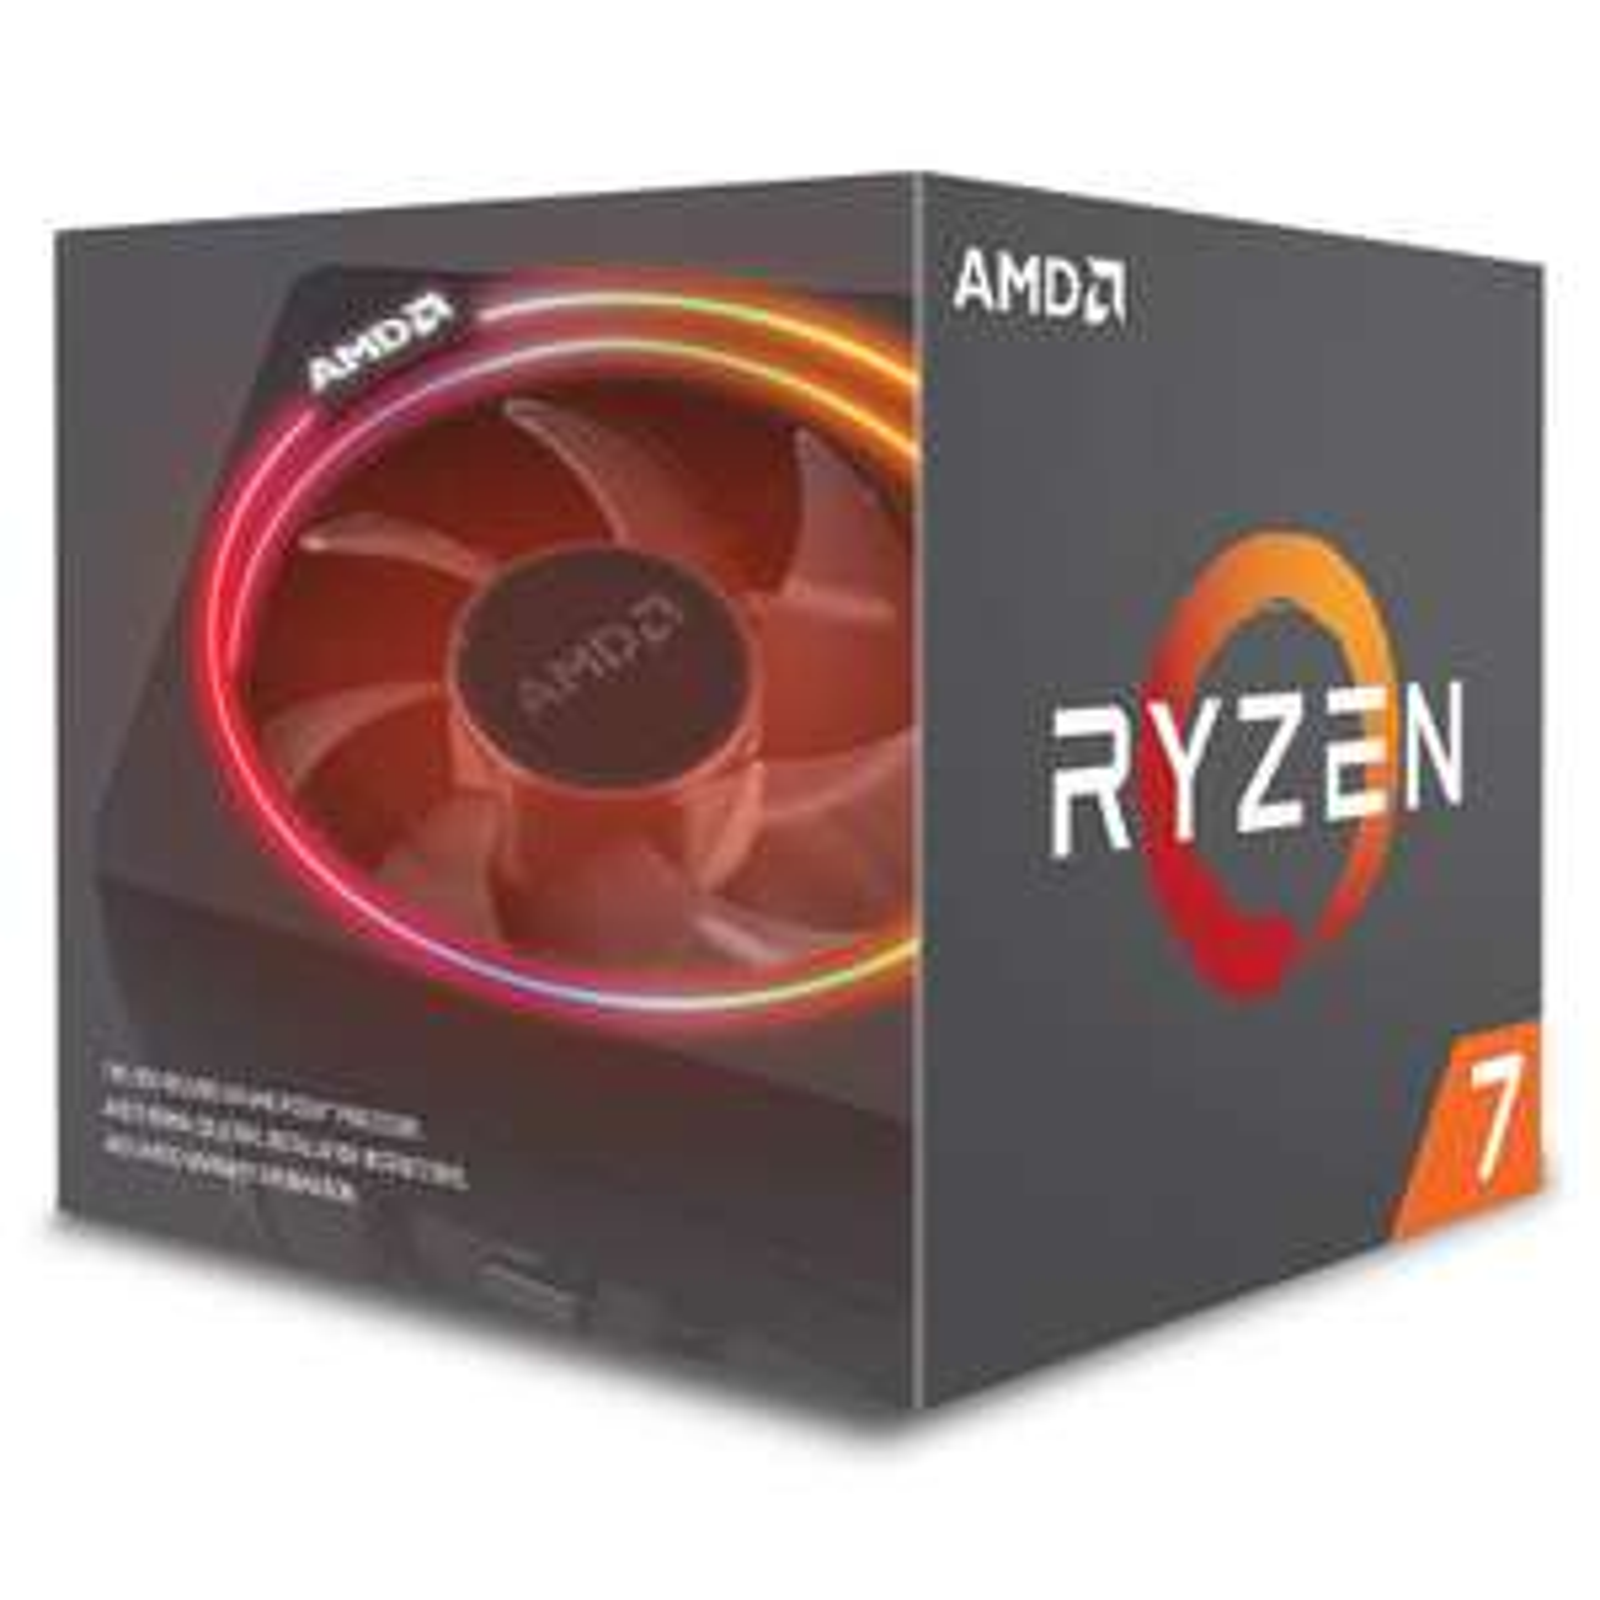 [CDAV] Processeur AMD Ryzen 7 2700X Wraith Prism Edition (3.7 GHz) + Jeux PC The Division 2 & World War Z offerts